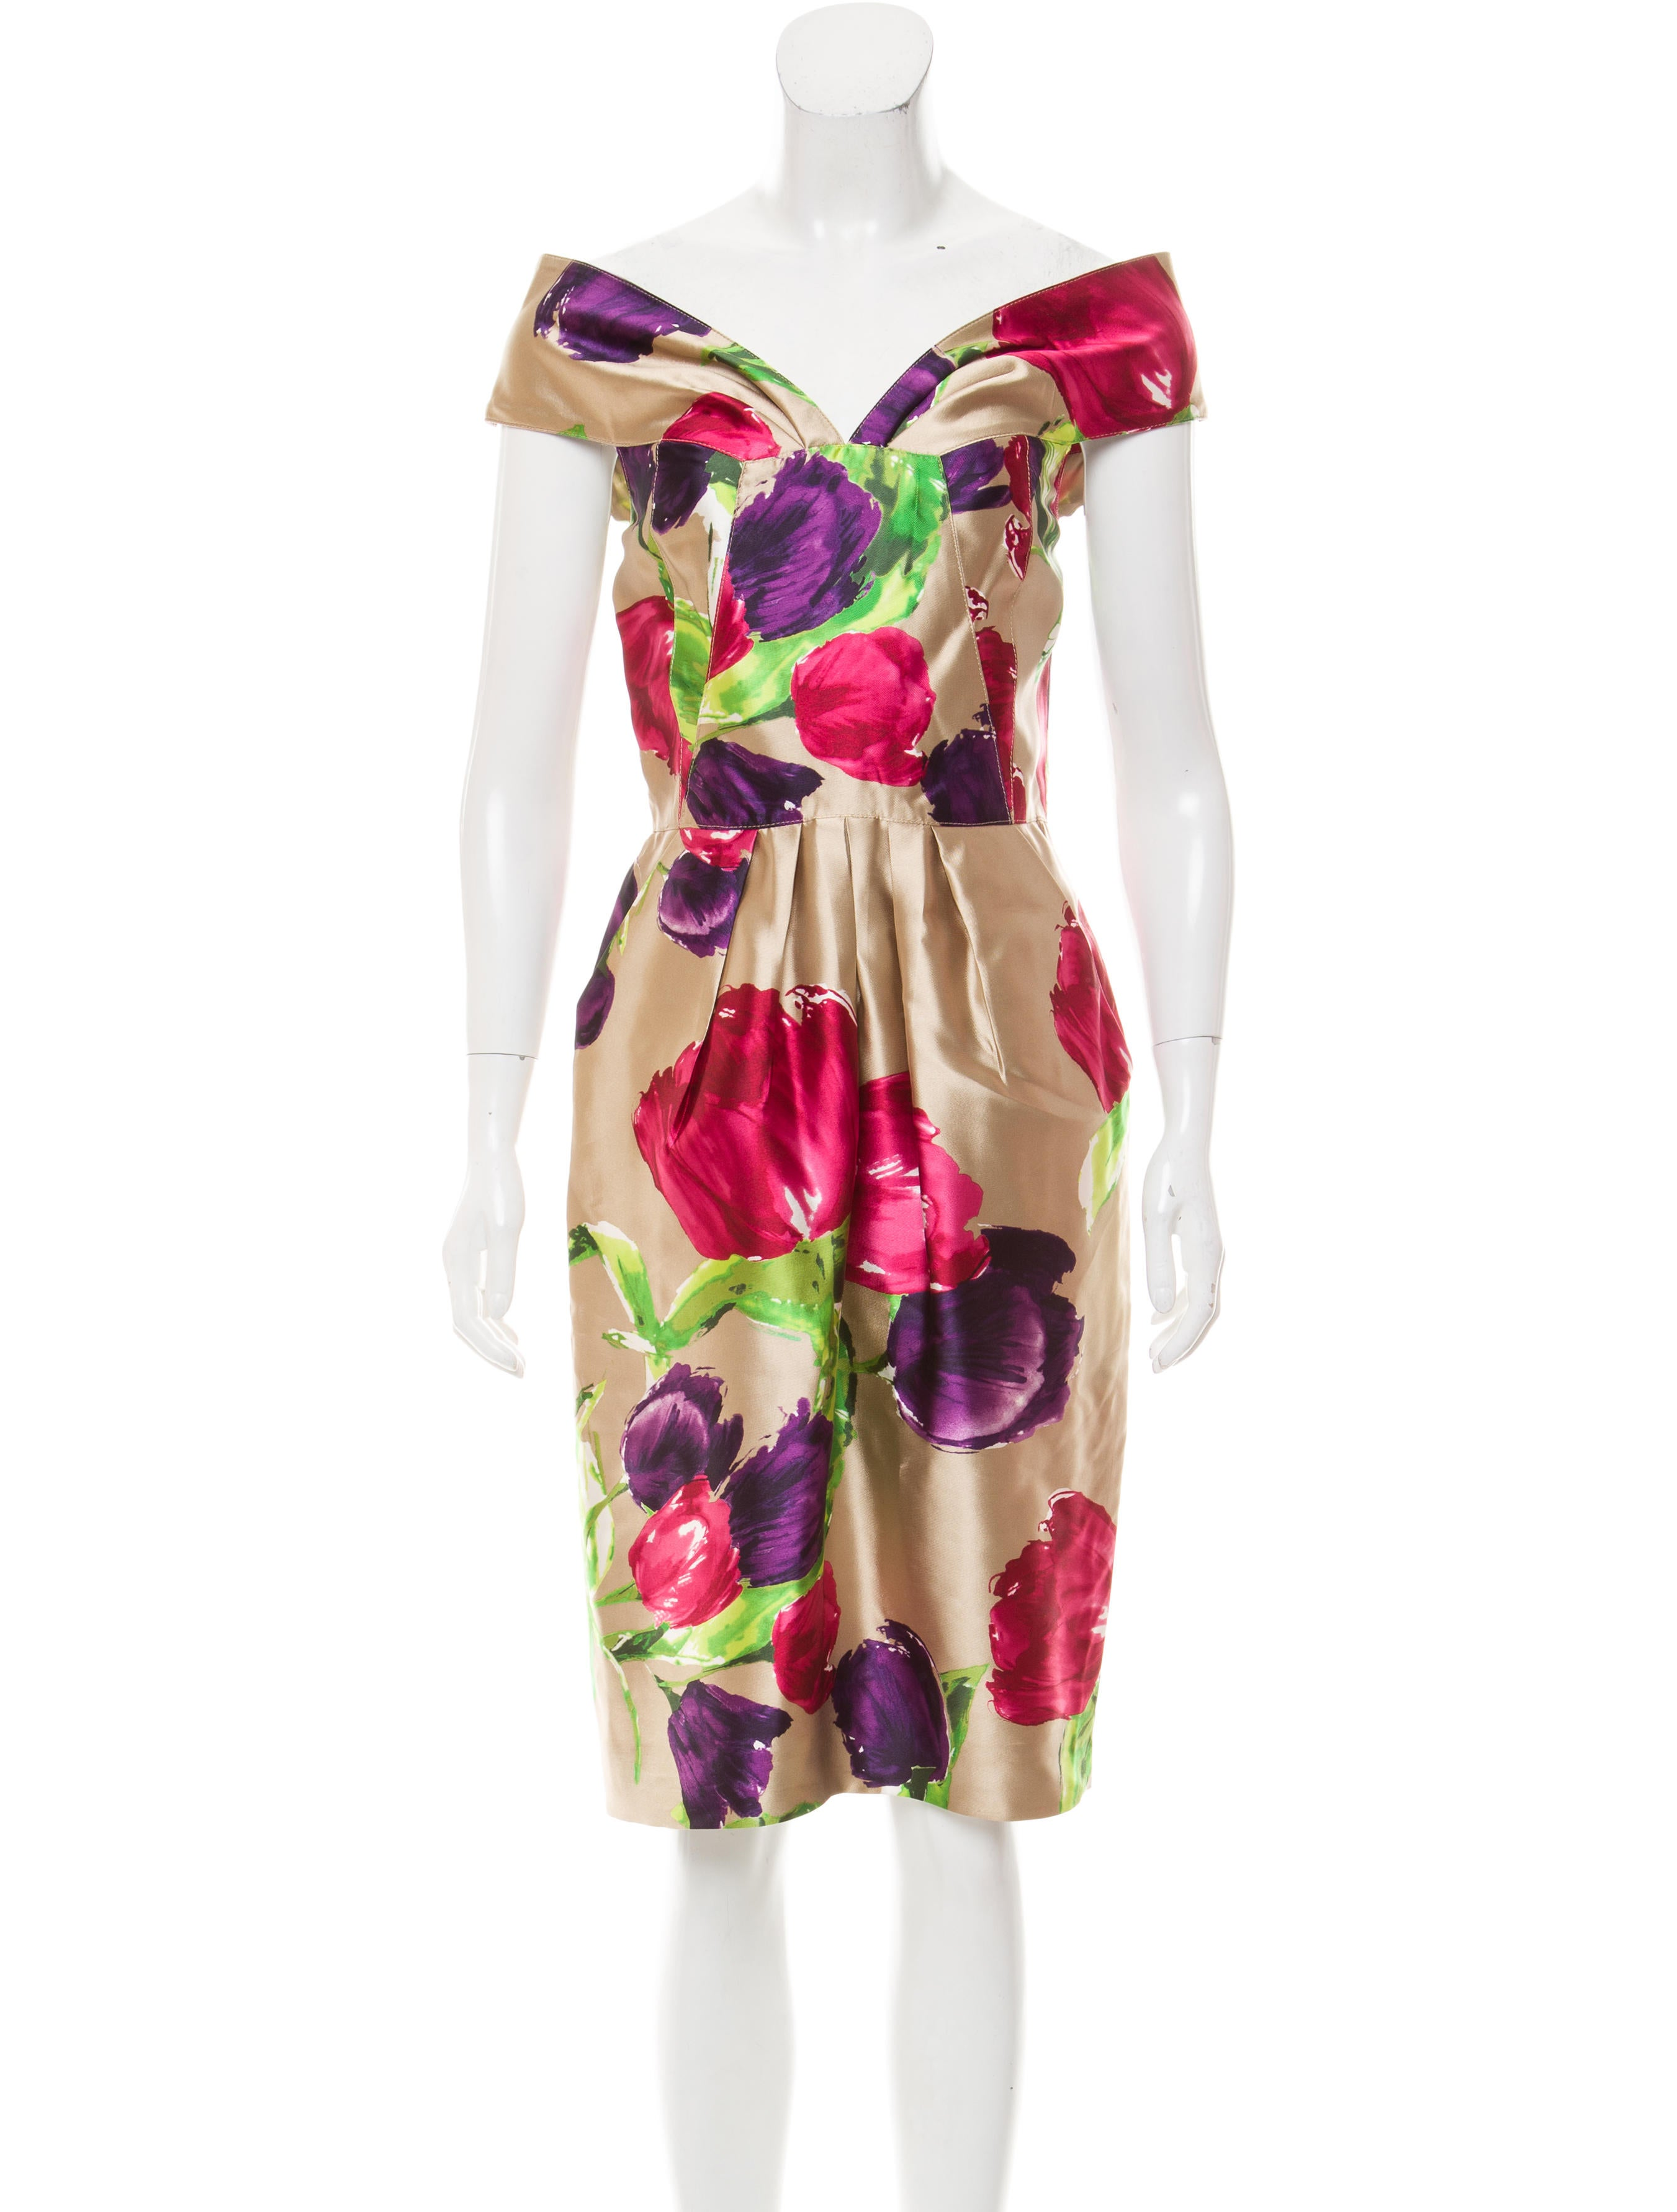 6505fd3cdd3 Oscar de la Renta Off-The-Shoulder Silk Dress w  Tags - Clothing ...